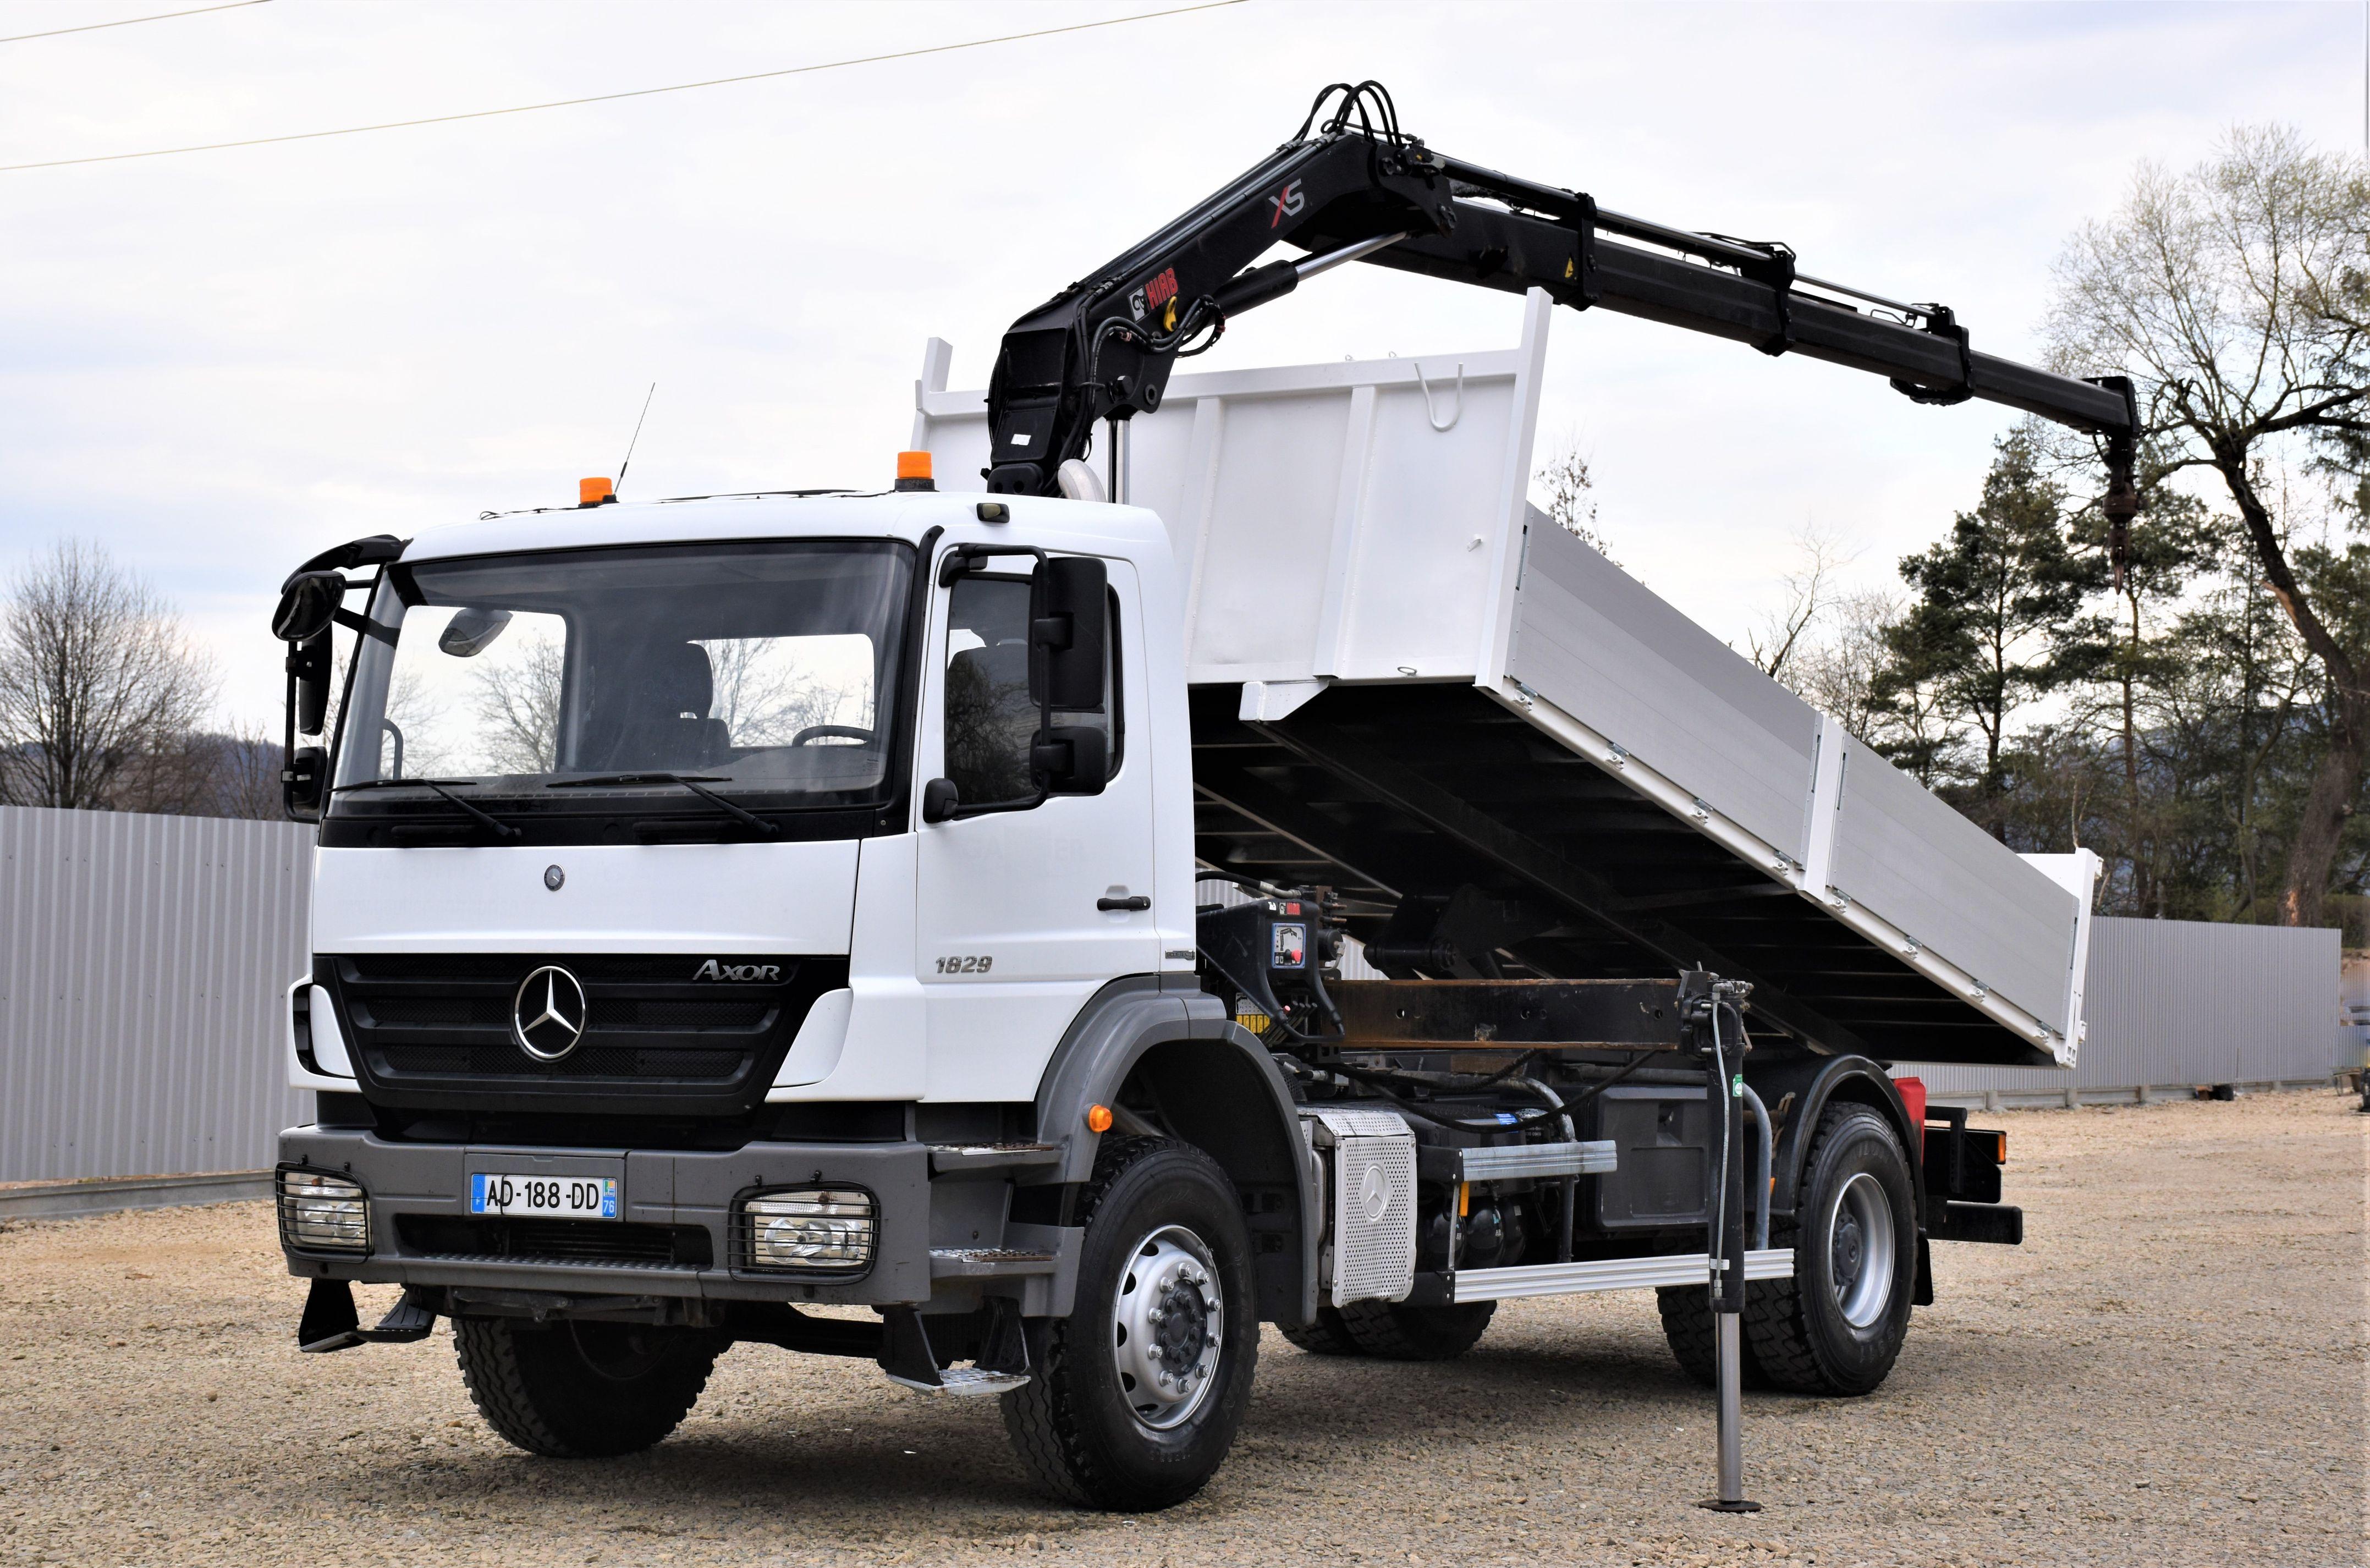 2010-mercedes-benz-axor-1829-365255-equipment-cover-image